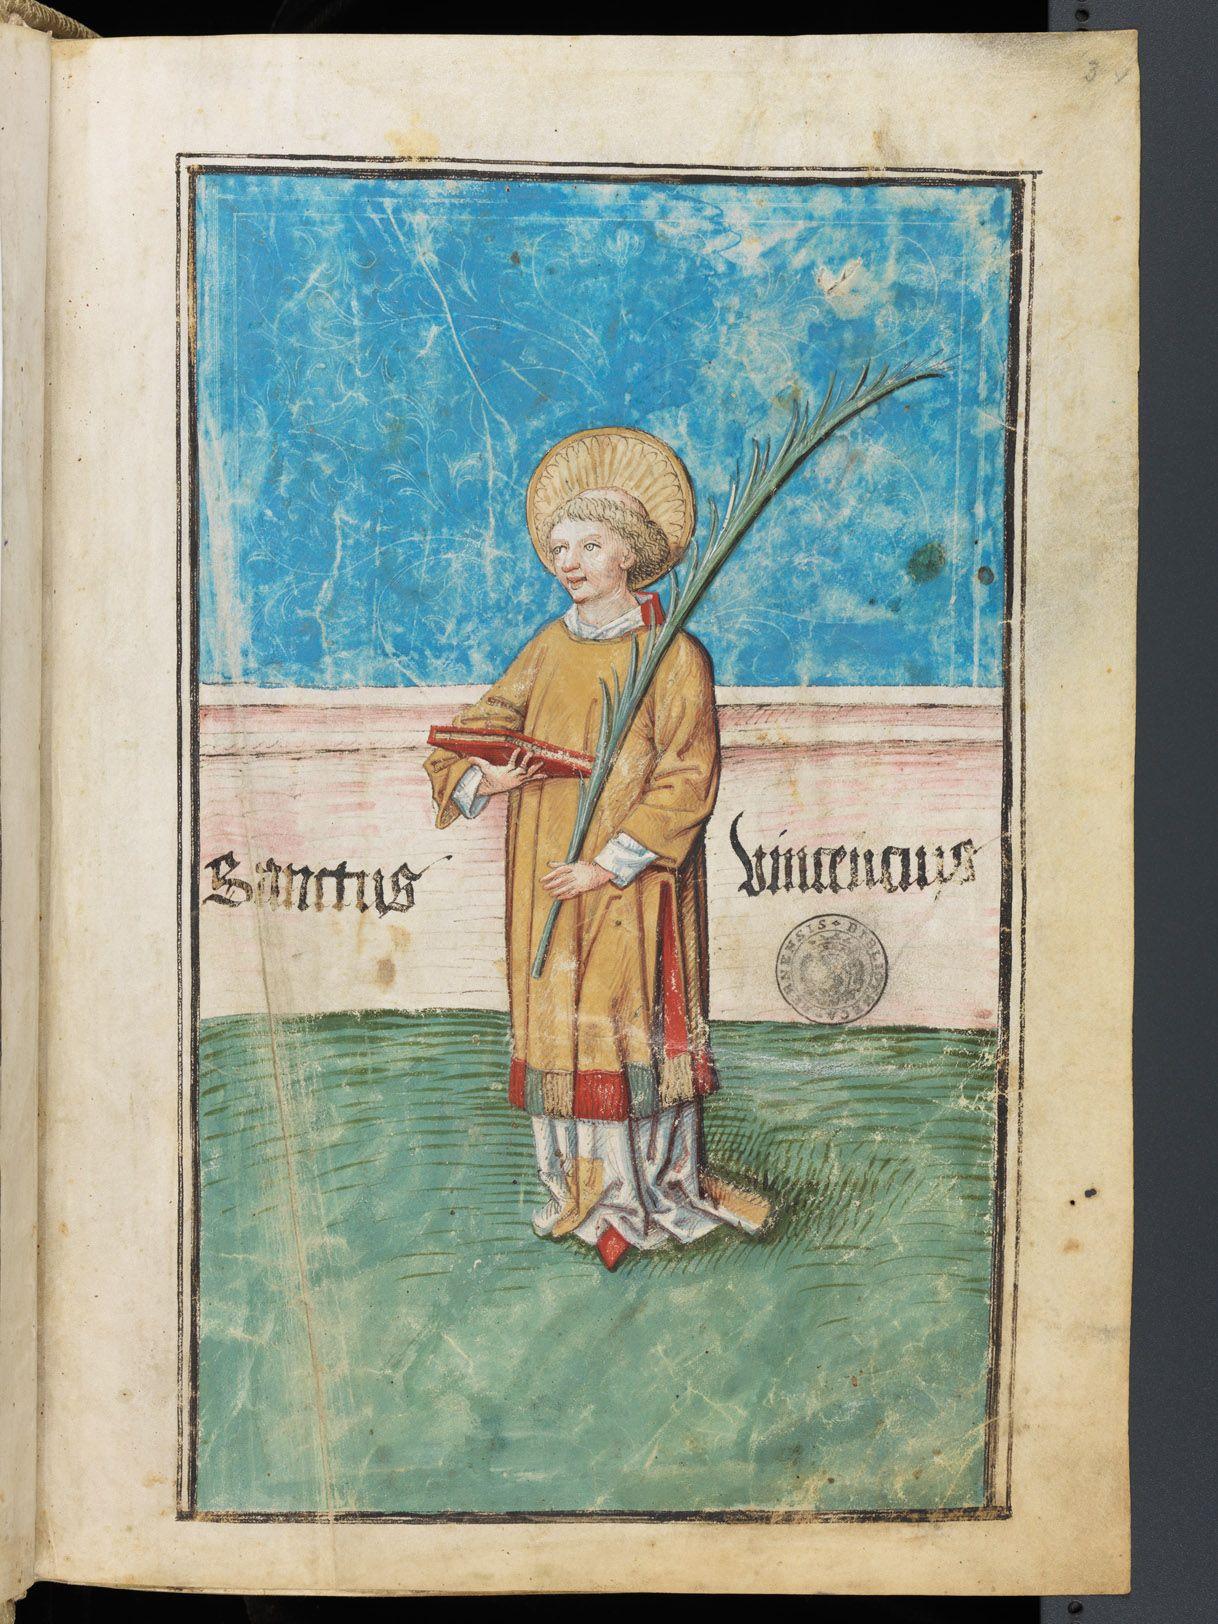 The Amtliche Berner Chronik (Official Chronicle of Bern) 1478-1483 Bern, Burgerbibliothek, Mss.h.h.I.3: Diebold Schilling, Amtliche Berner Chronik, vol. 3 (http://www.e-codices.unifr.ch/en/list/one/bbb/Mss-hh-I0003)